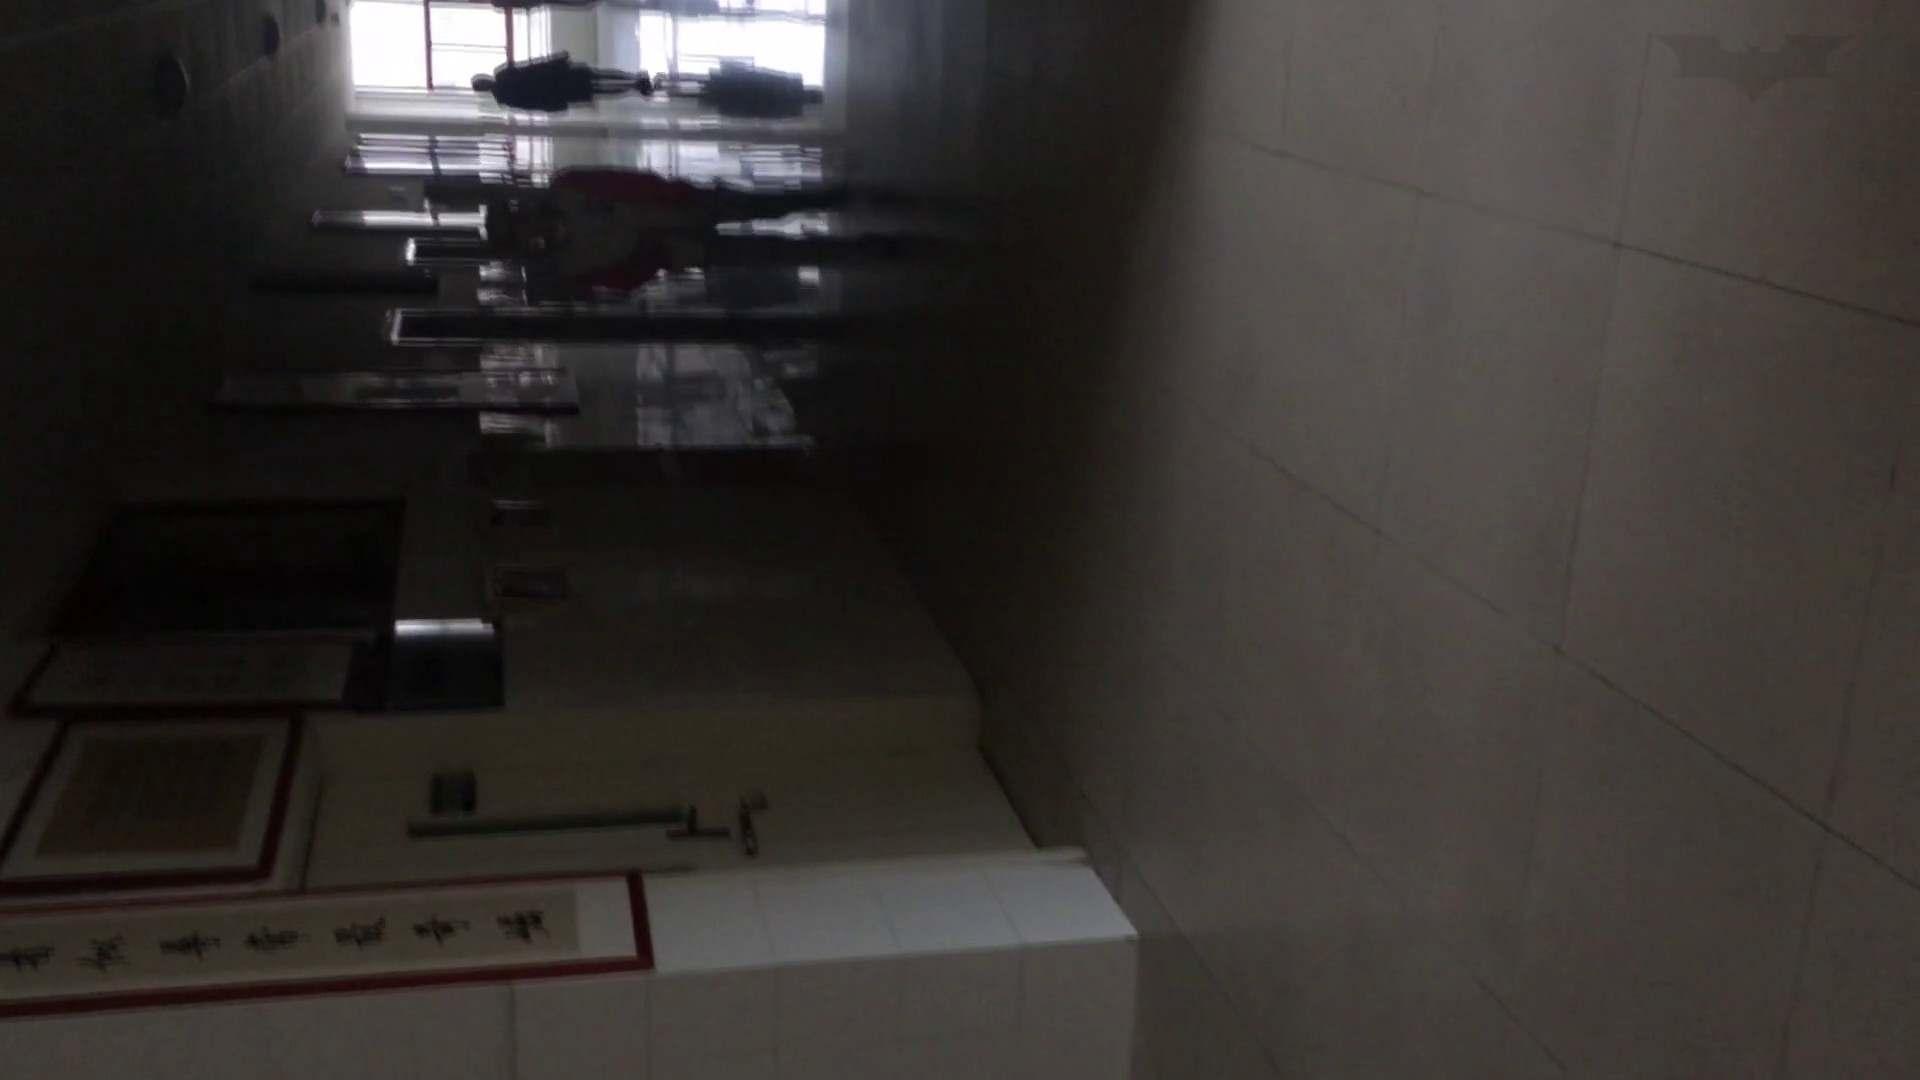 芸術大学ガチ潜入盗撮 JD盗撮 美女の洗面所の秘密 Vol.80 盗撮・必見 スケベ動画紹介 53画像 43